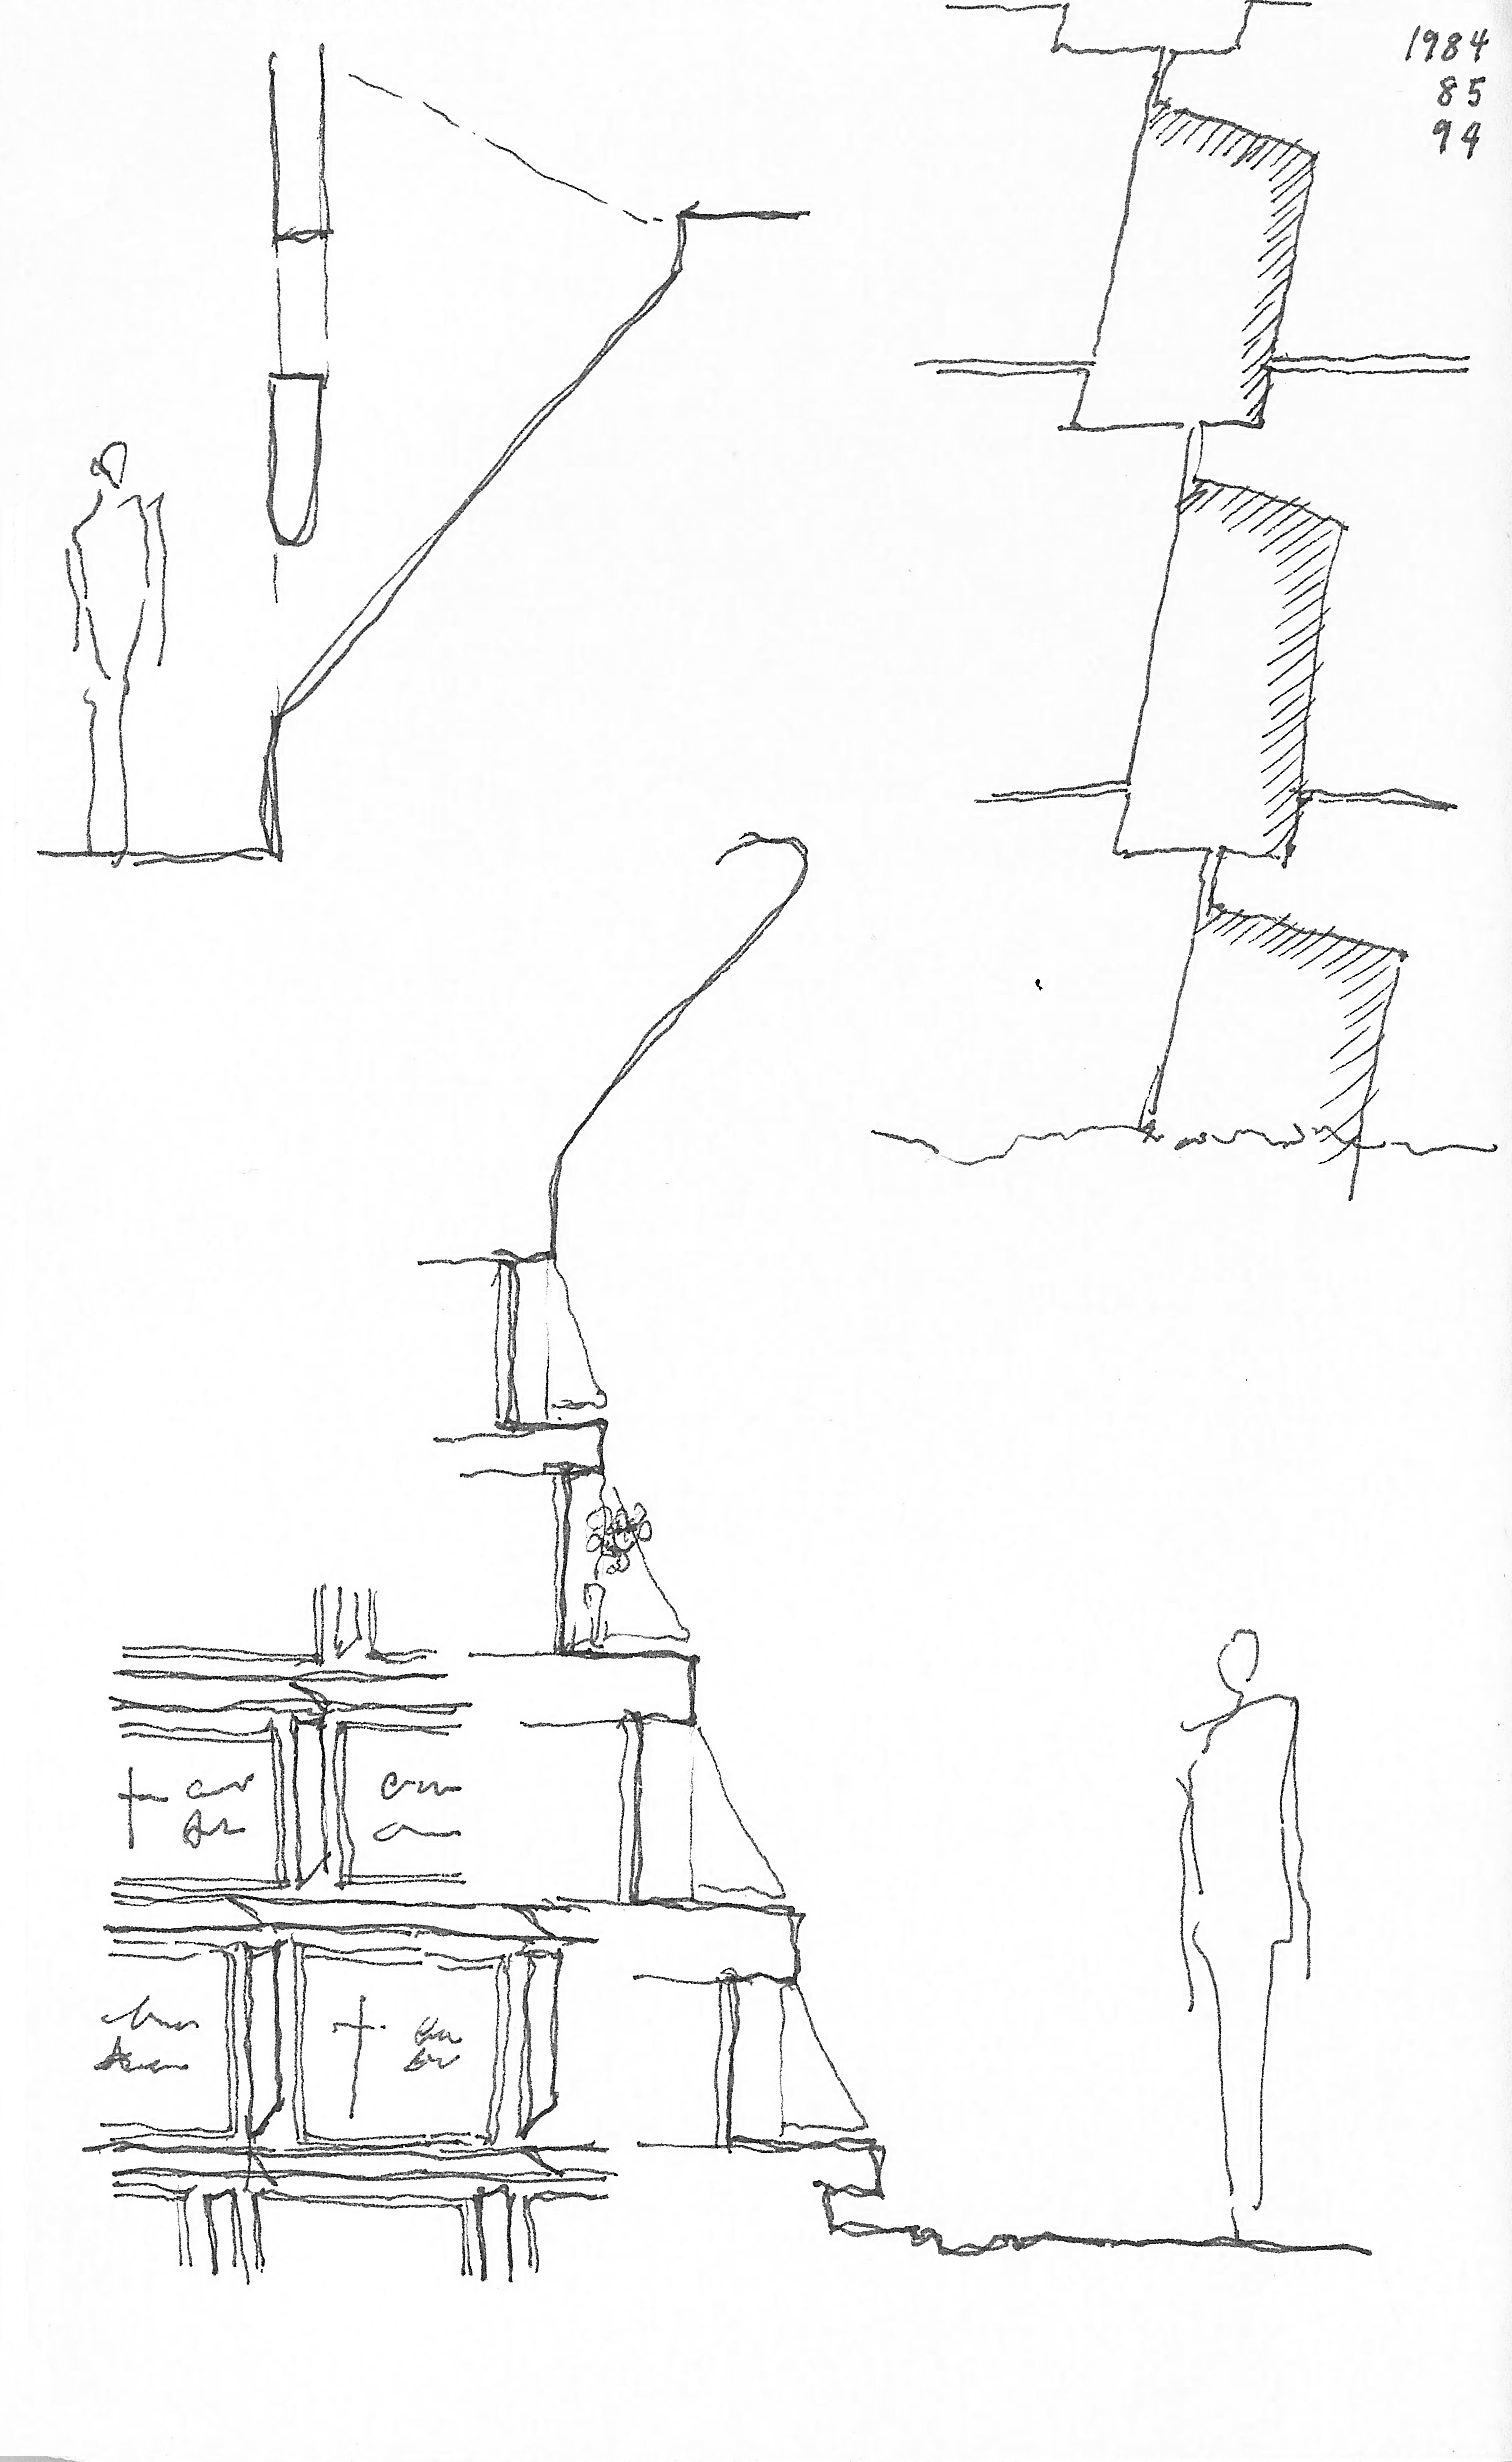 28a.jpg